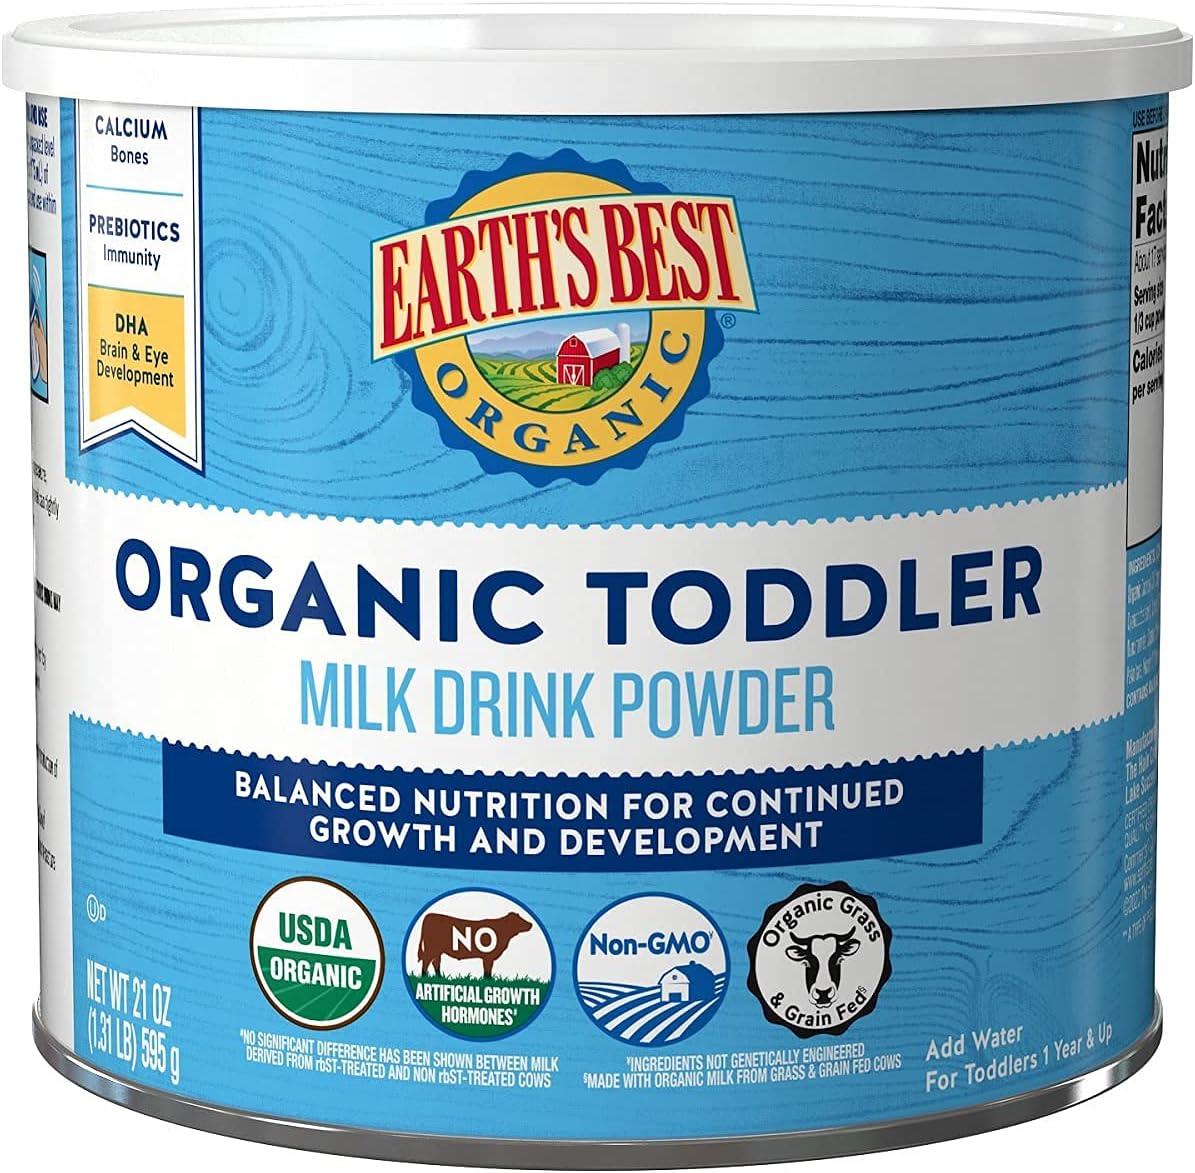 mart Earth's Best Organic Toddler In stock Milk Drink Powder Vanilla Natural